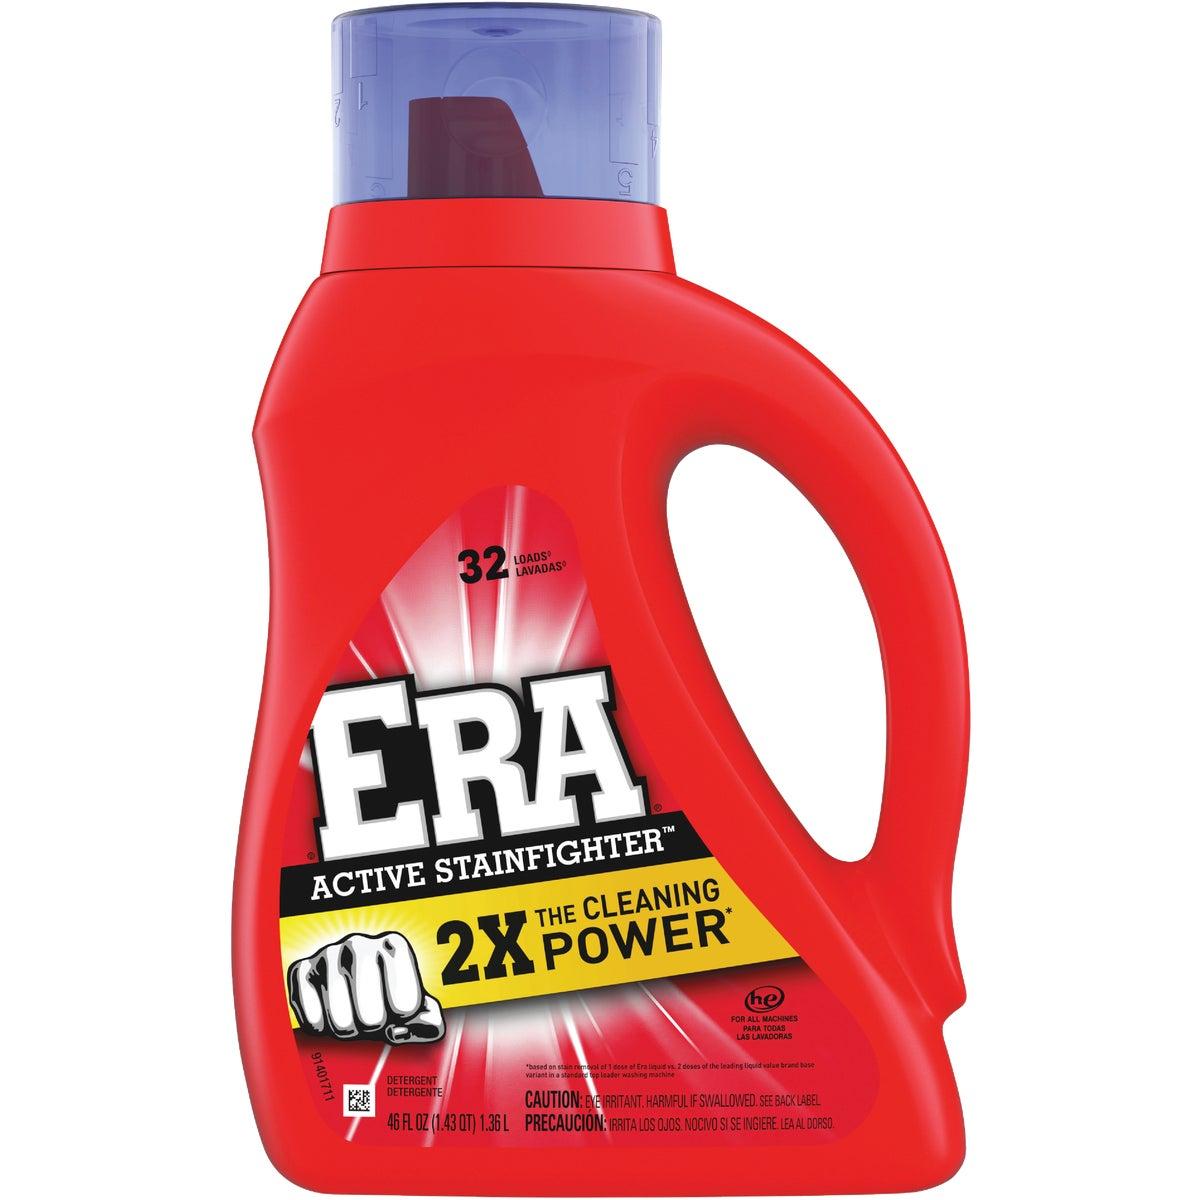 Era Active Stainfighter Liquid Laundry Detergent, 12889